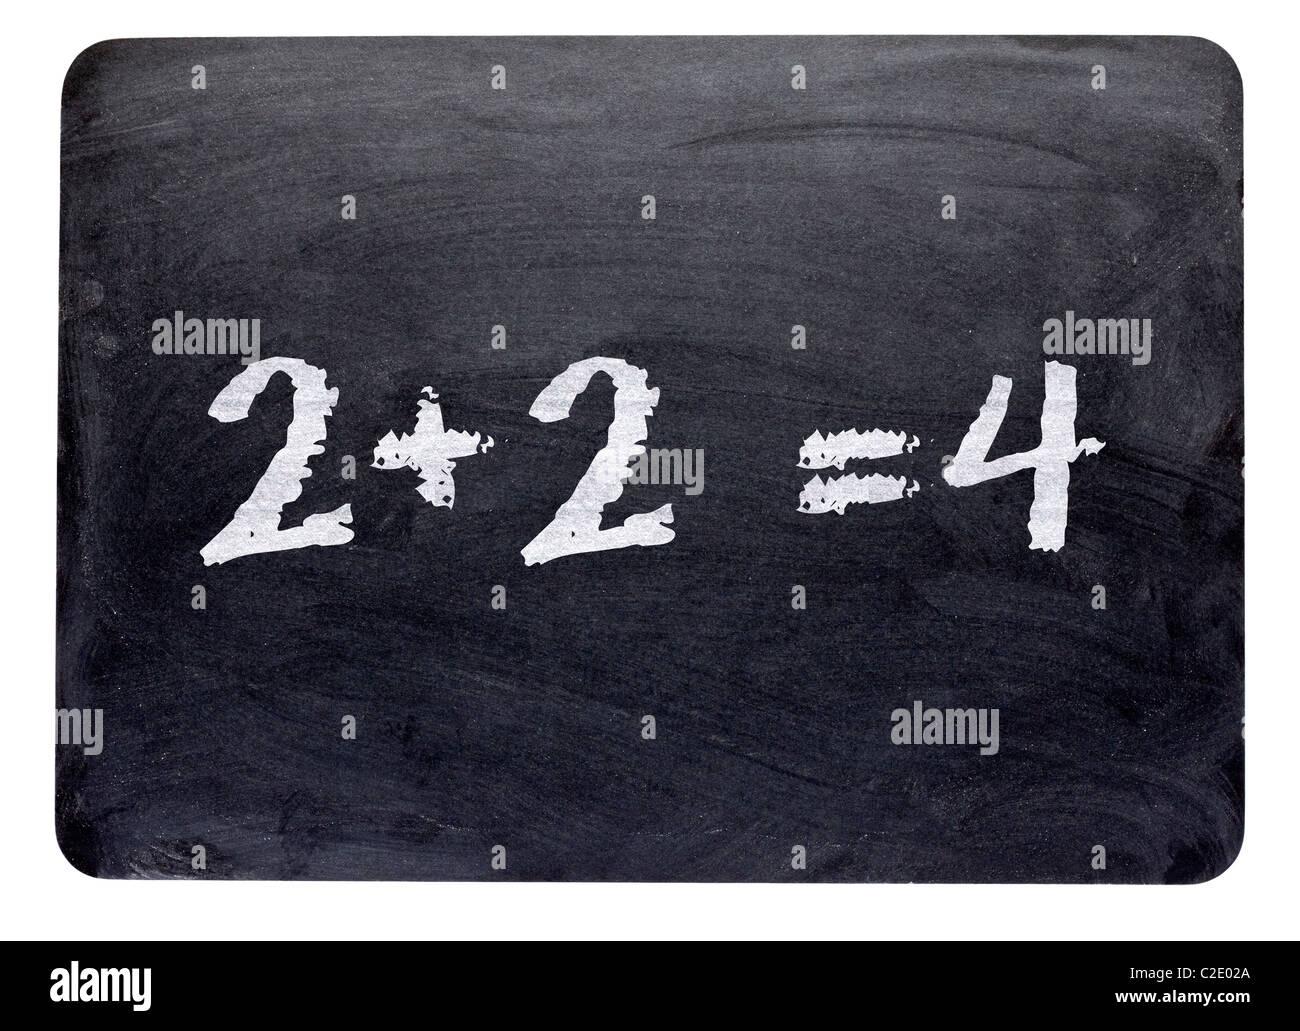 Simple mathematics sum written on a blackboard close up - Stock Image